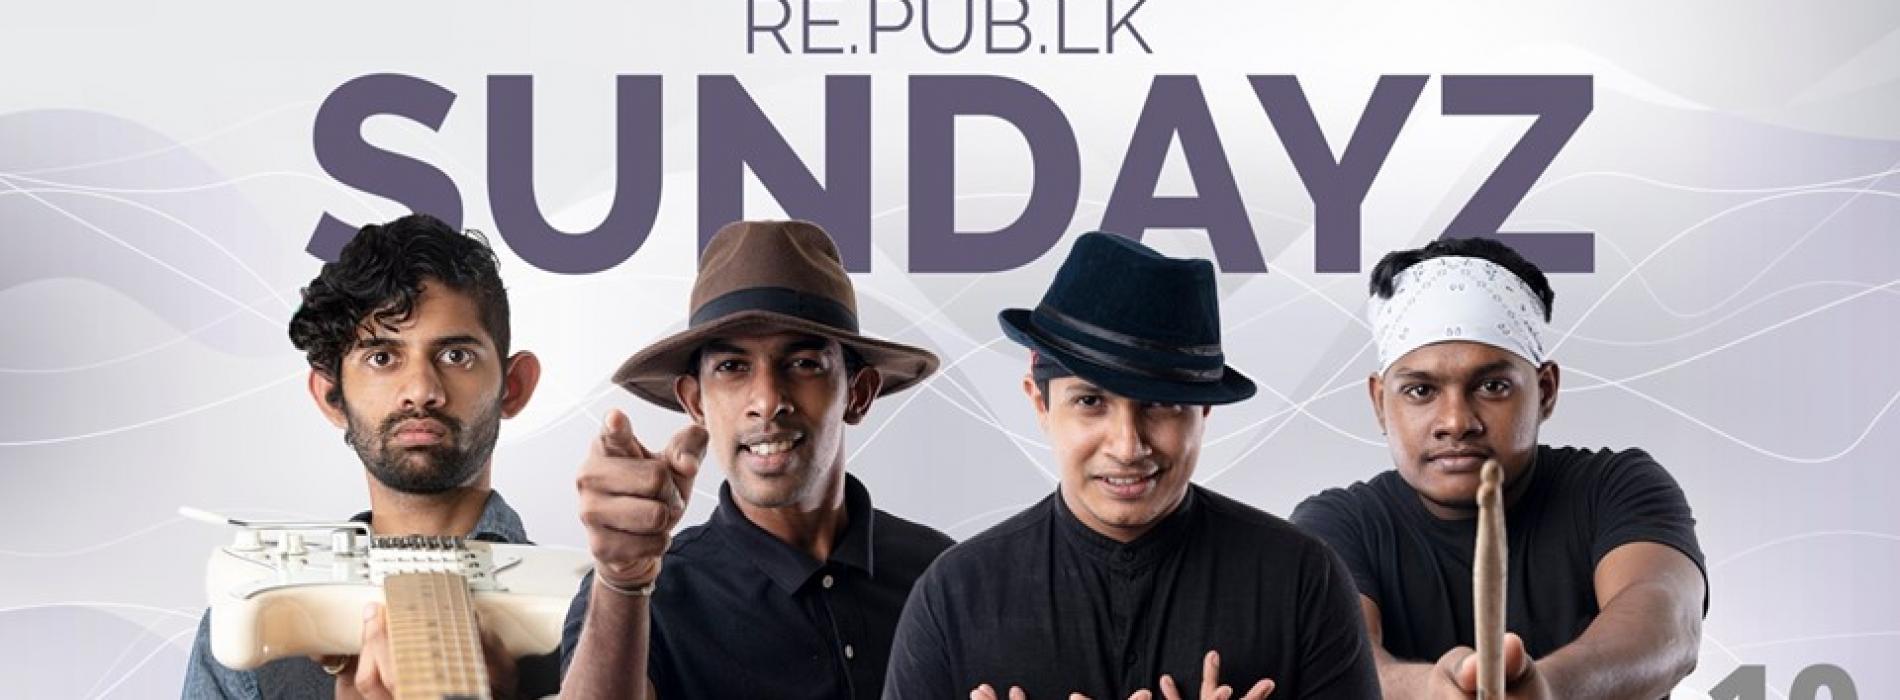 Re.Pub.LK Sundayz – Open Mic